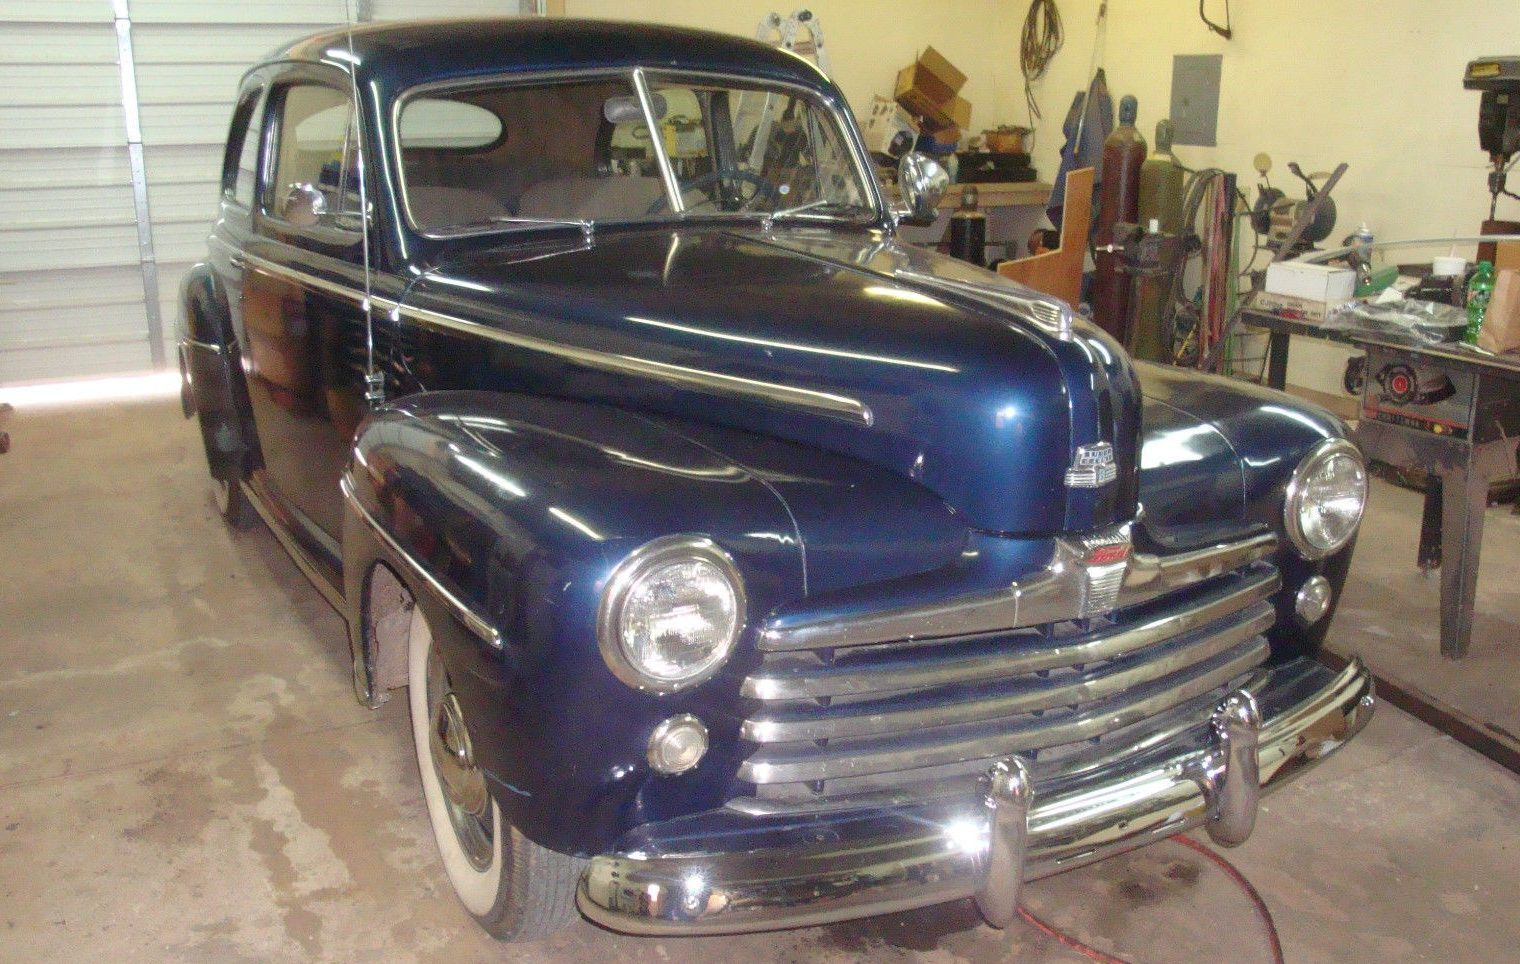 Prewar Style 1948 Ford Super Deluxe